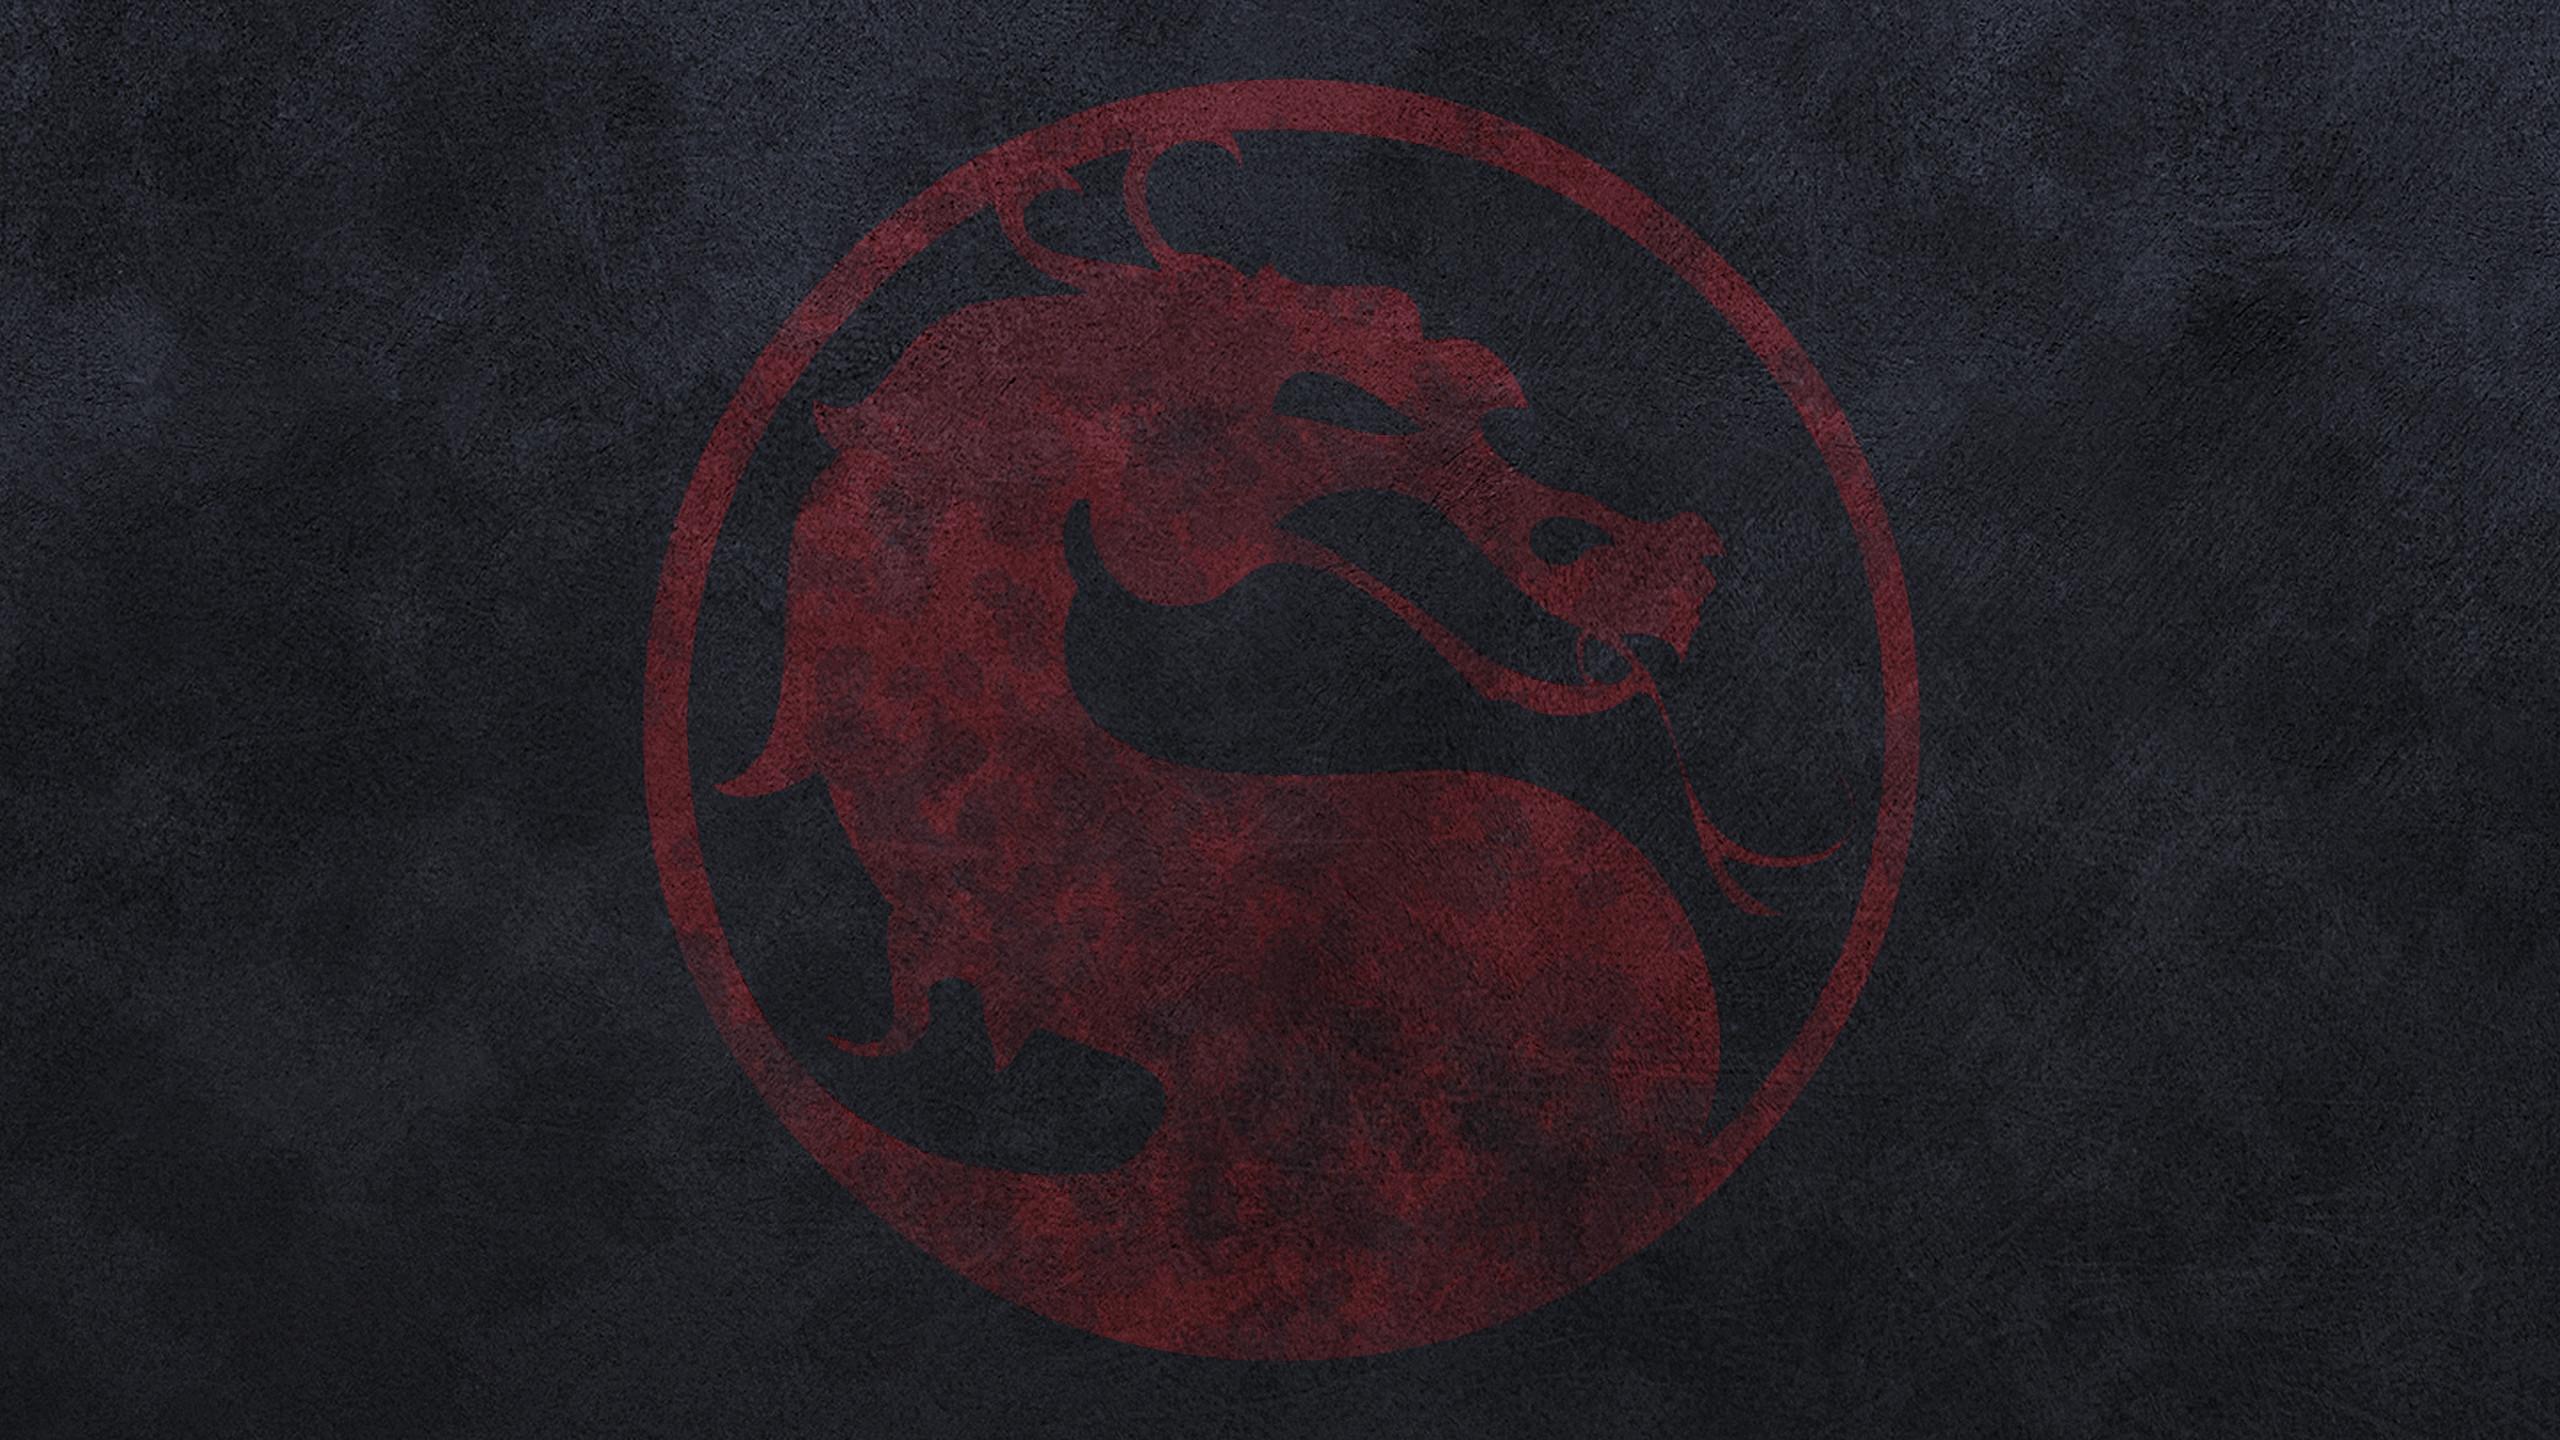 Mortal Kombat Logo Wallpapers 72 Images